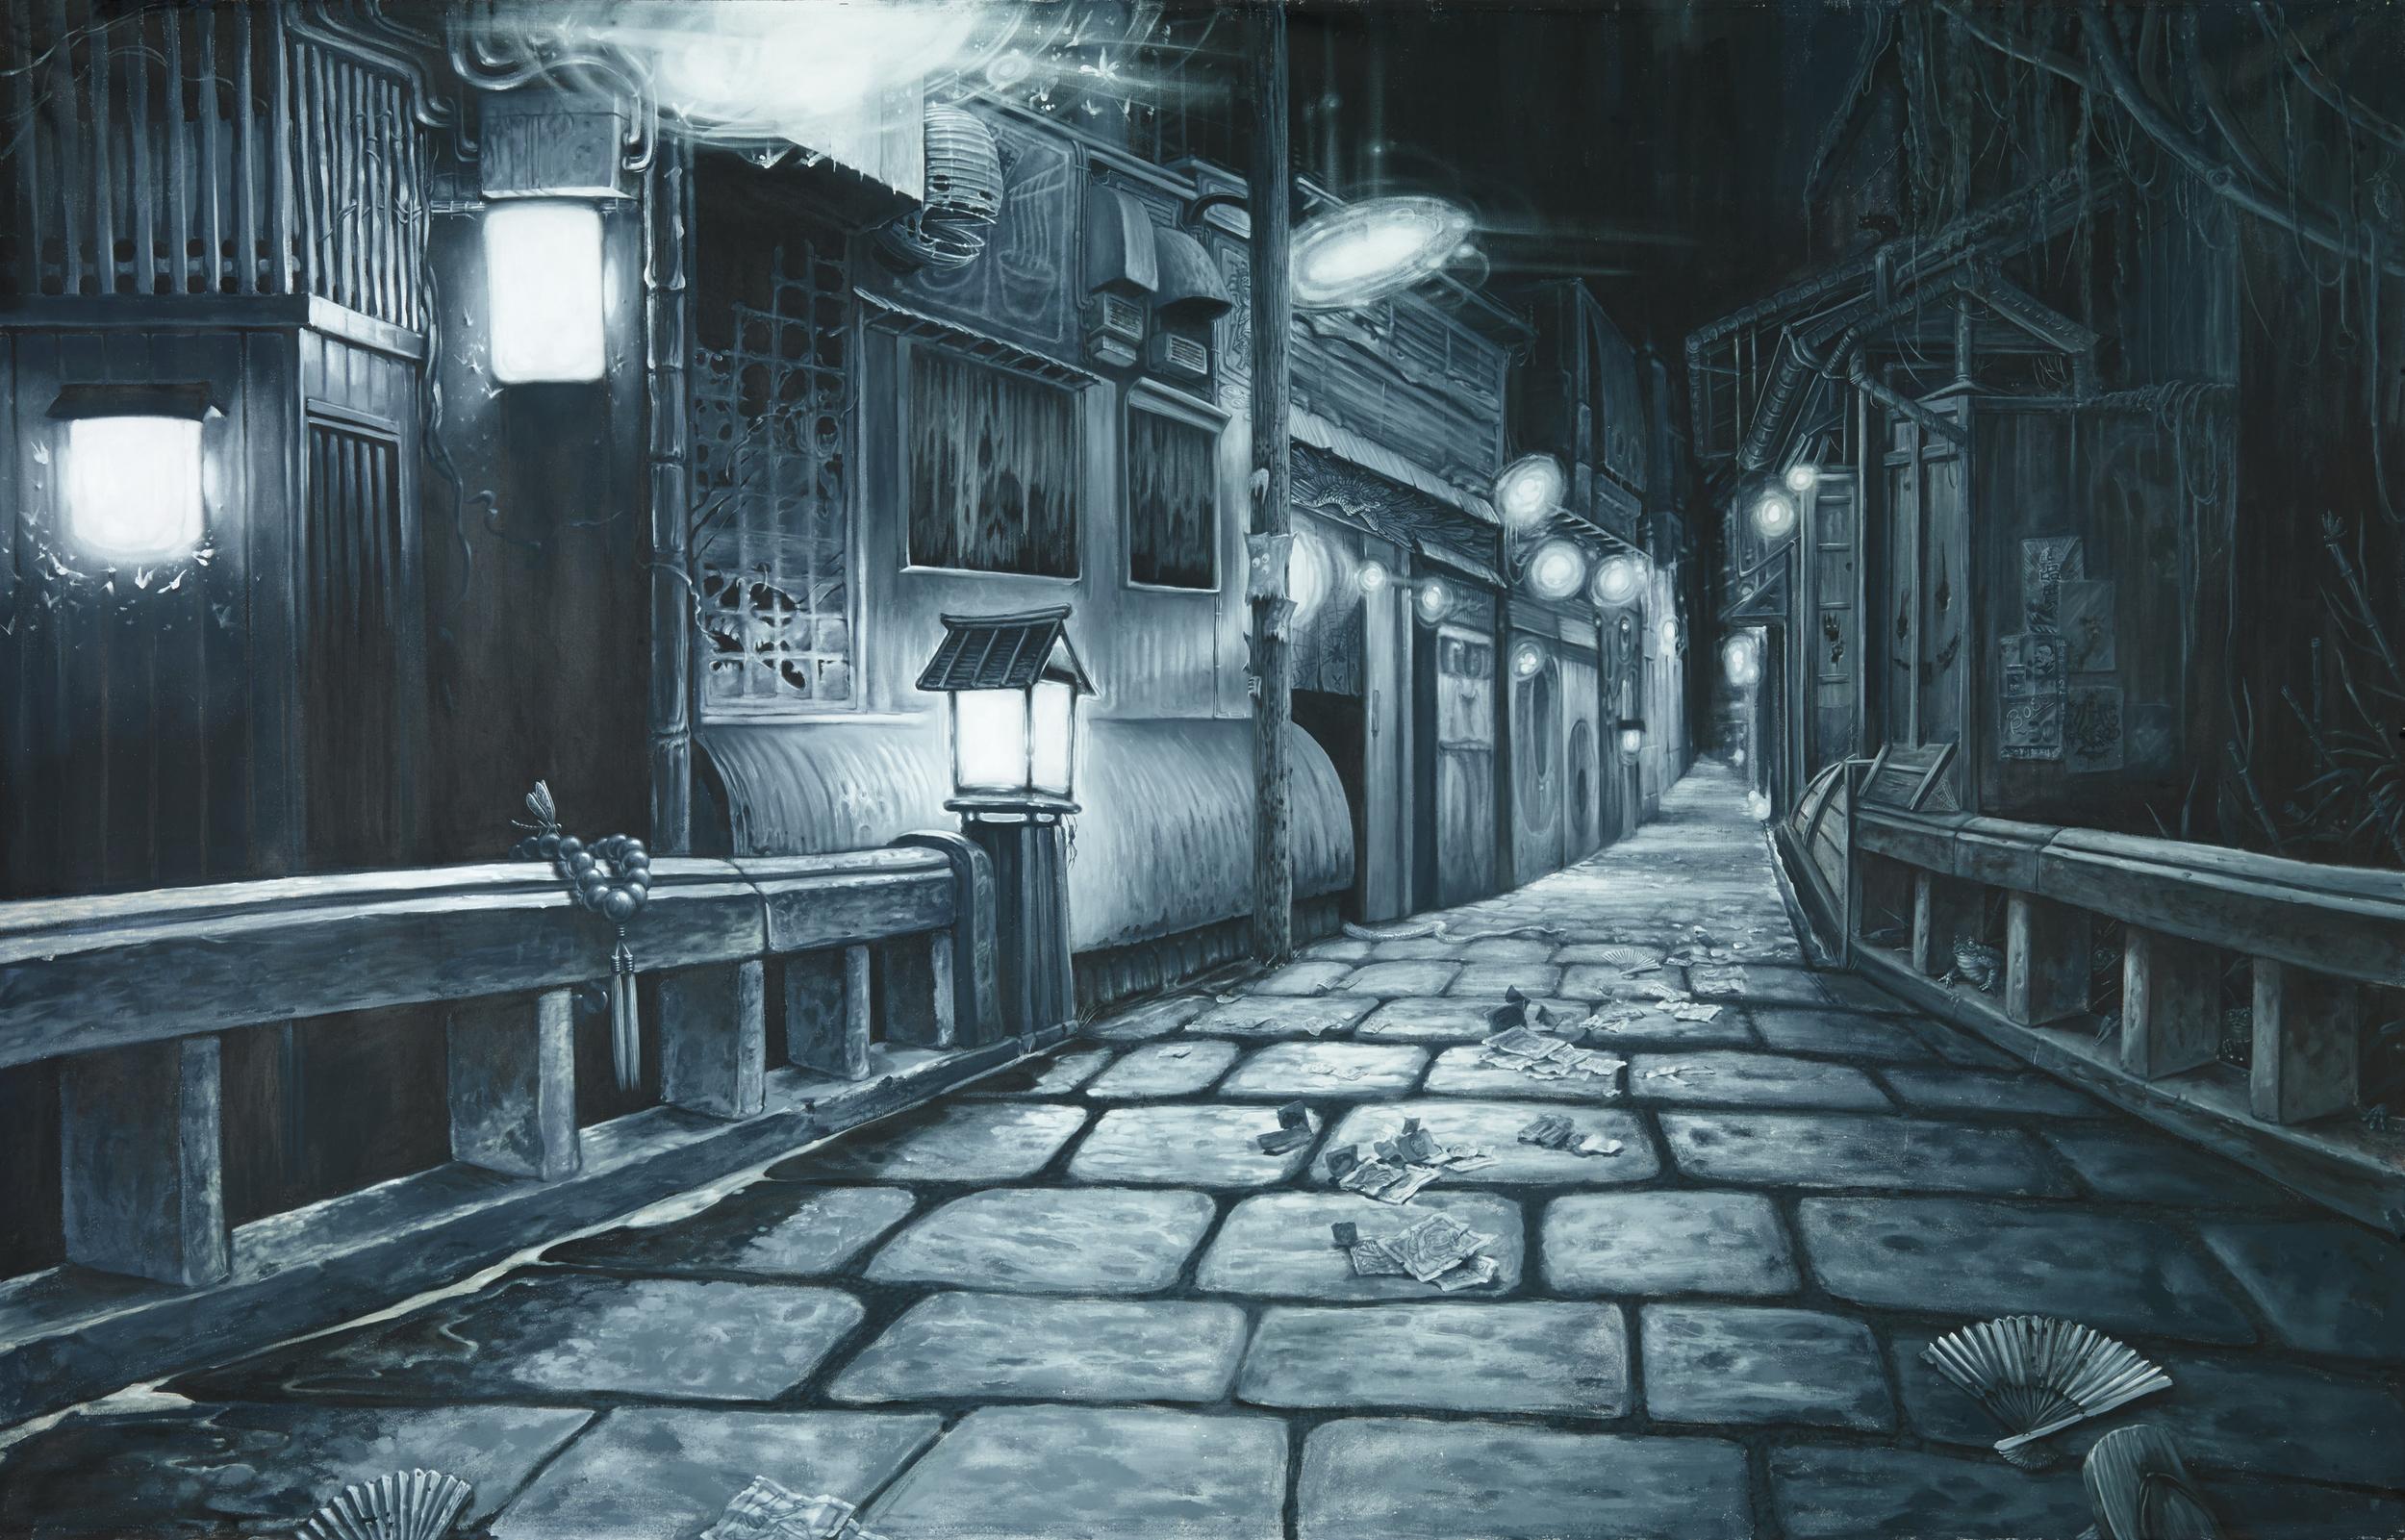 Christopher Brand, Espi, Evan Skrederstu & Steve Martinez. Yokai Street . 2014 - acrylic on canvas. 6' x 8'.